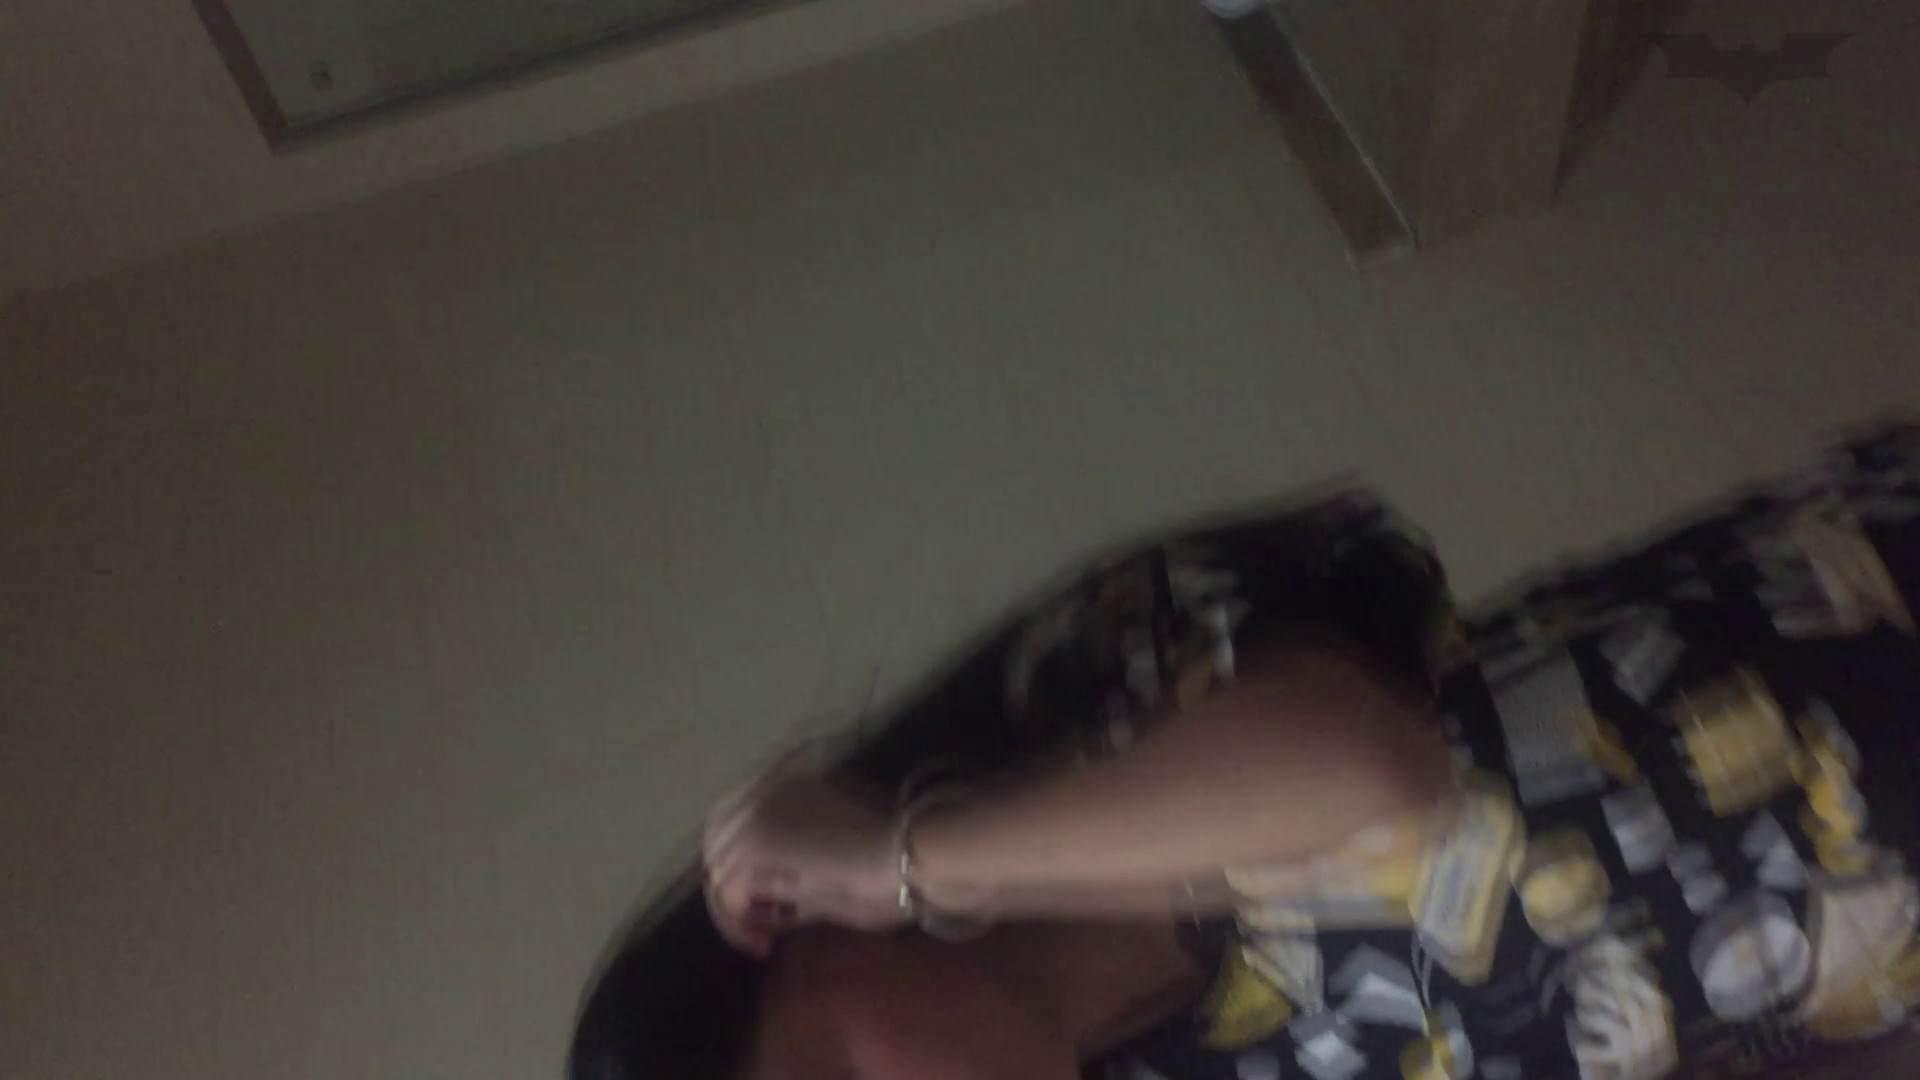 JD盗撮 美女の洗面所の秘密 Vol.70 美肌 エロ画像 110枚 49